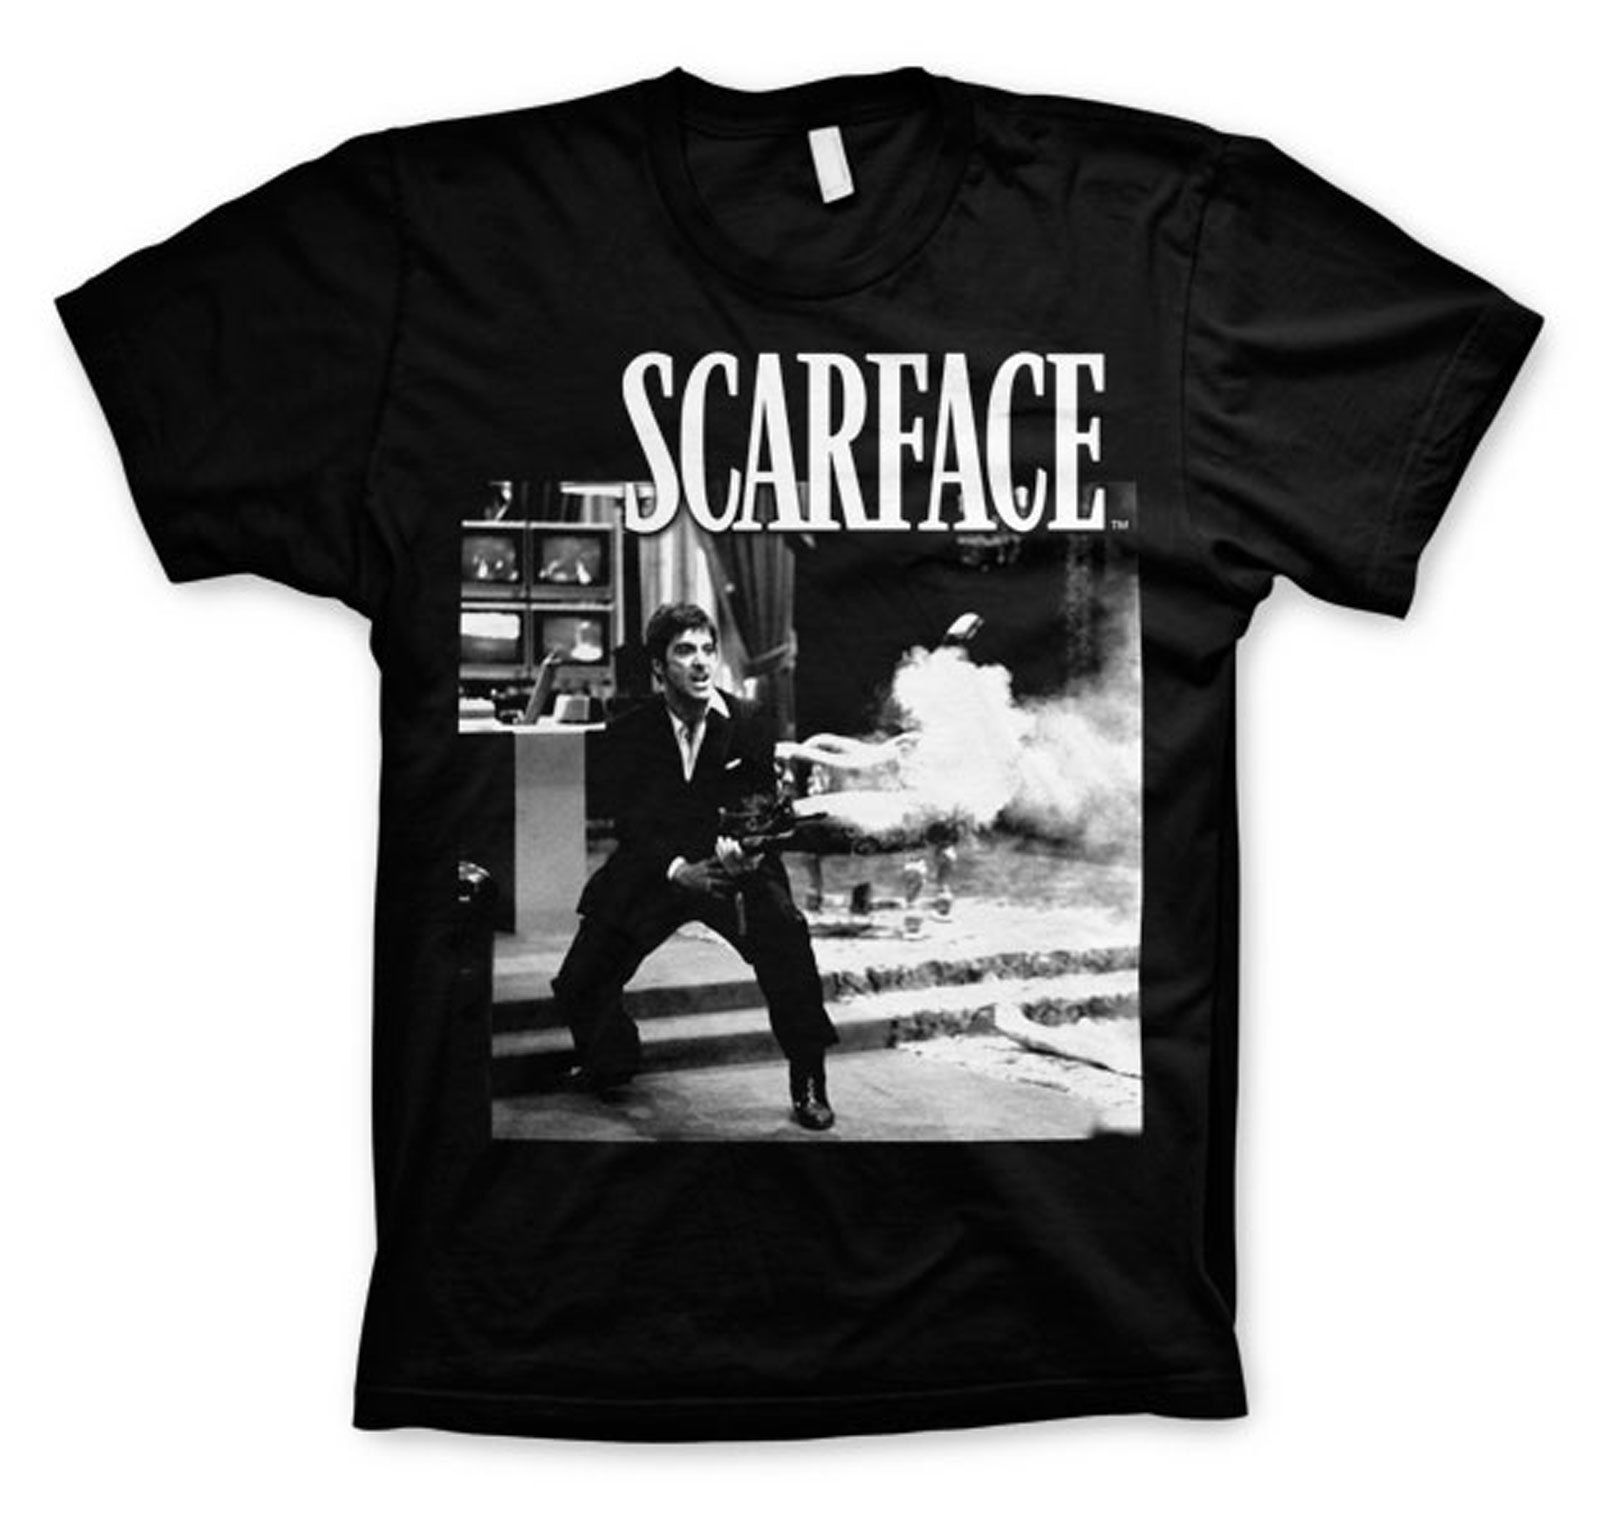 Unisexe licencia oficial Scarface película Tony Montana camiseta Noir hombres camiseta imprimir algodón manga corta Camiseta